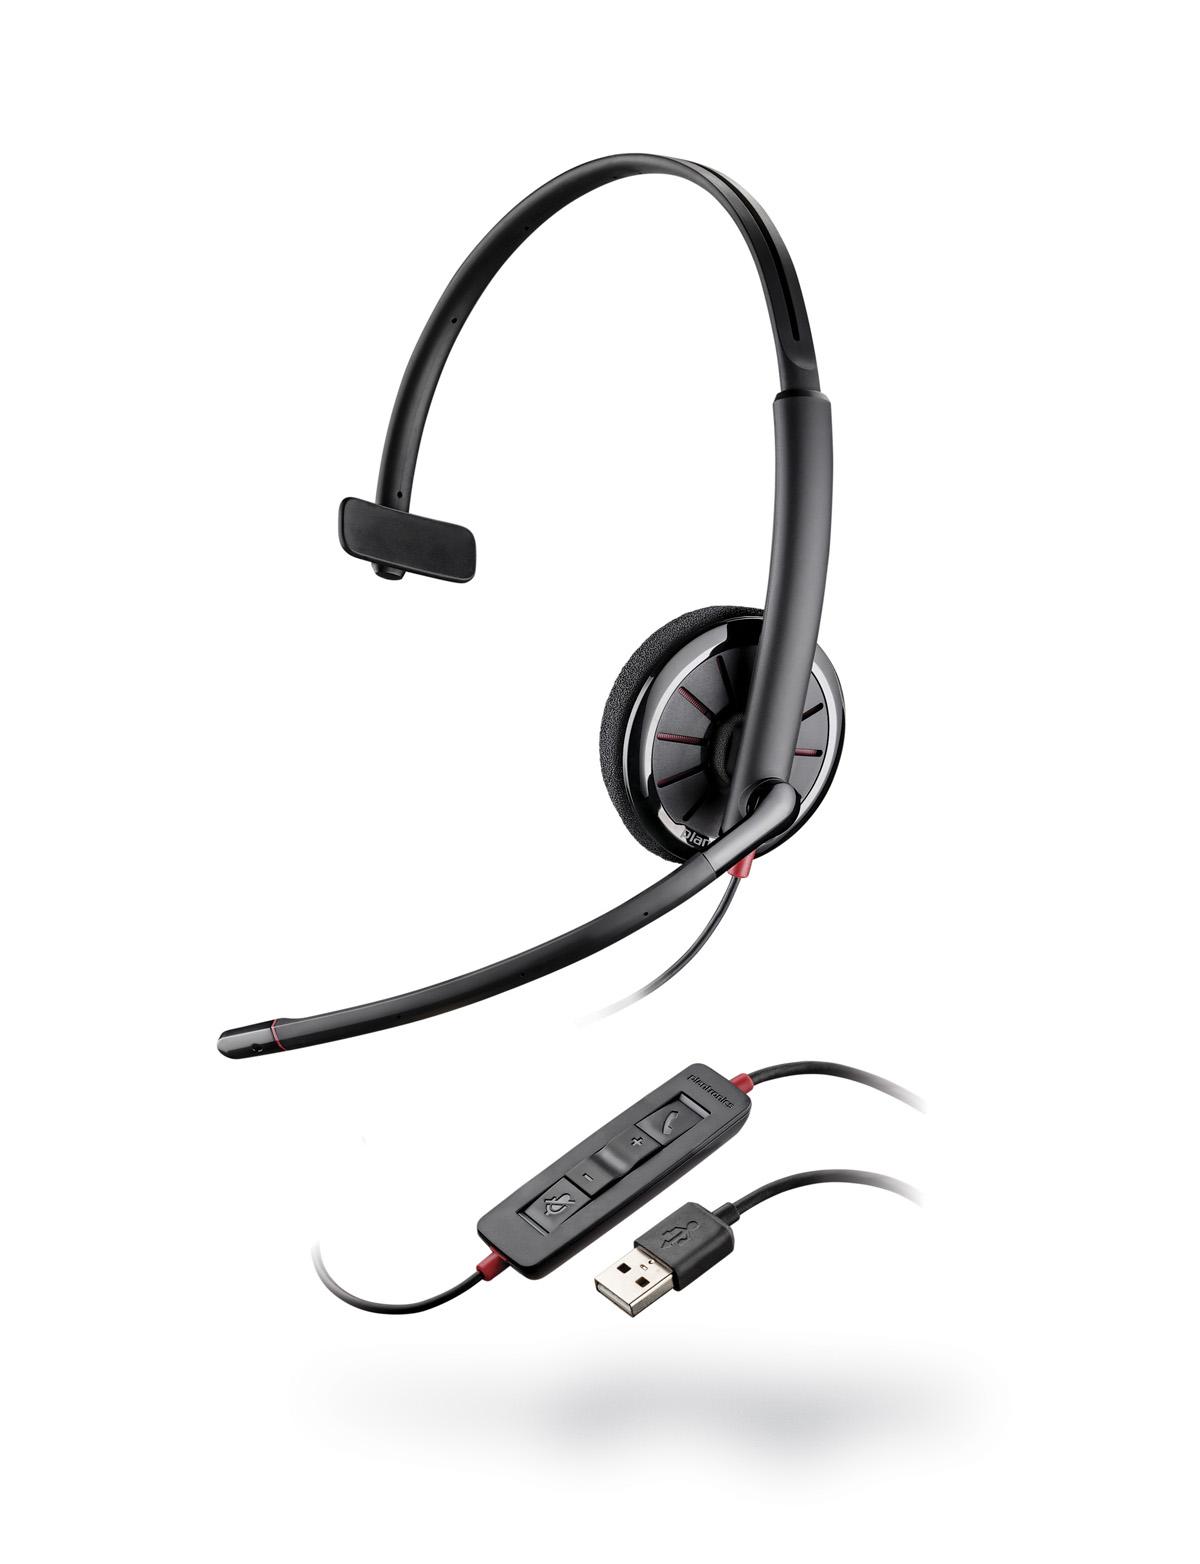 Plantronics BLACKWIRE C310-M USB Headset